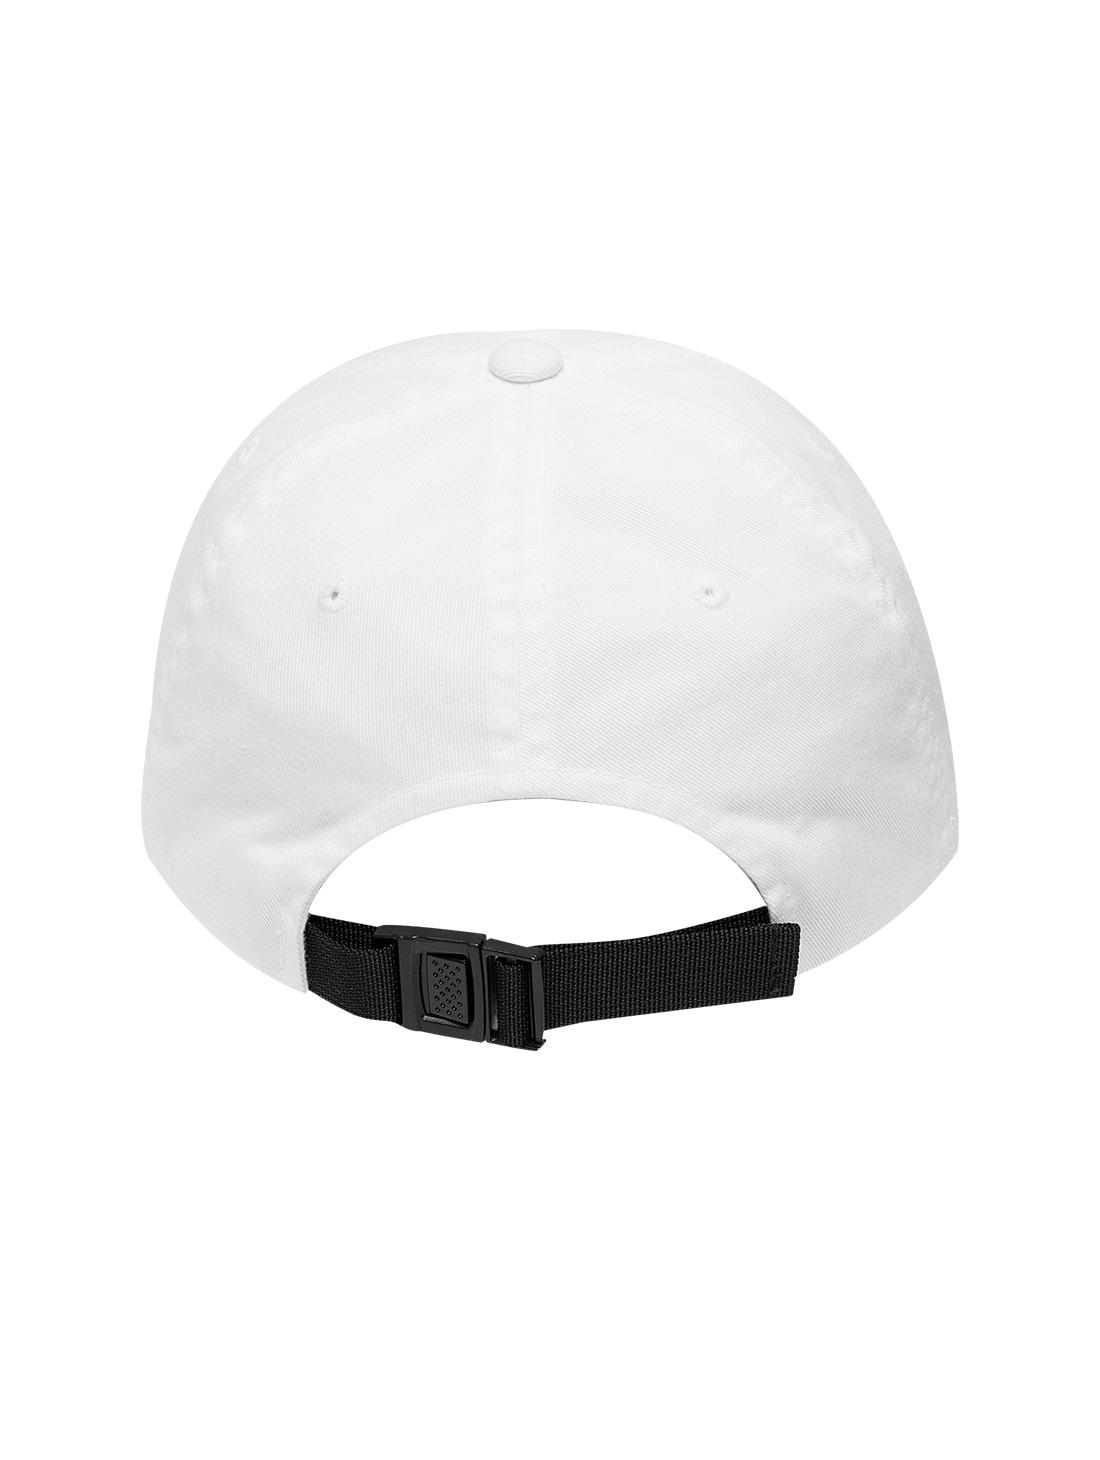 MC BALL CAP - WHITE